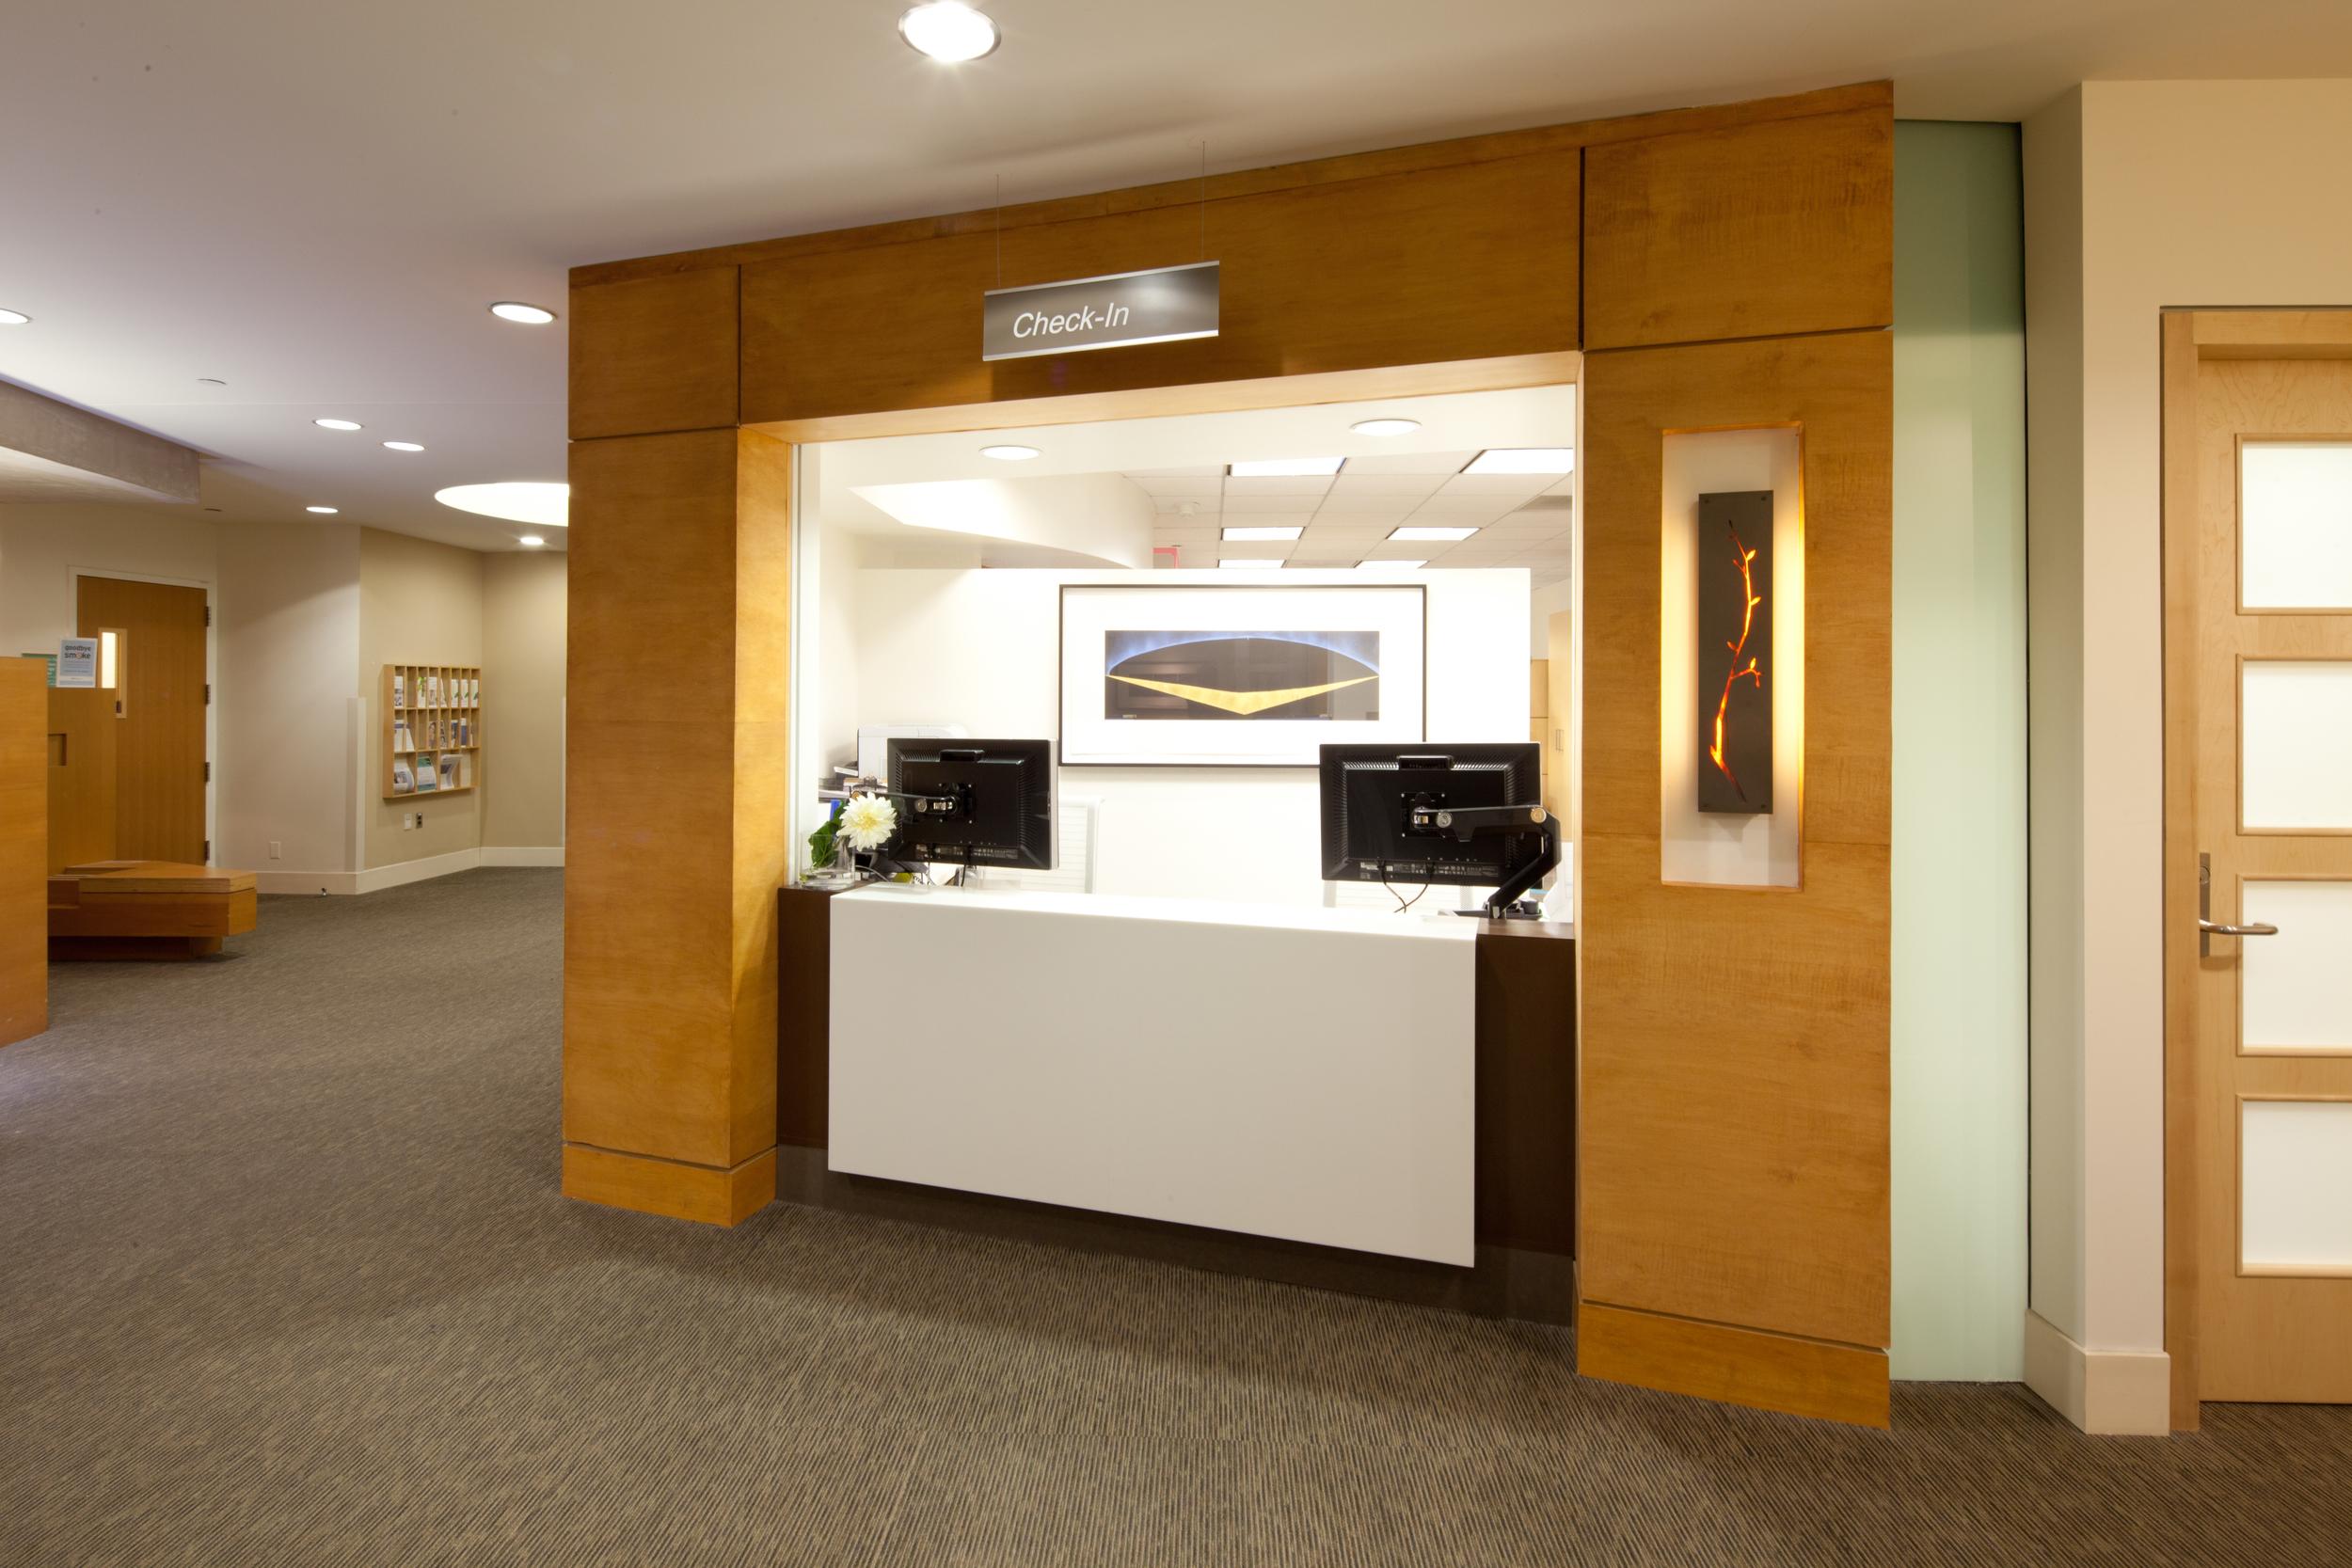 UCLA Medical Plaza Radiation/Oncology Department